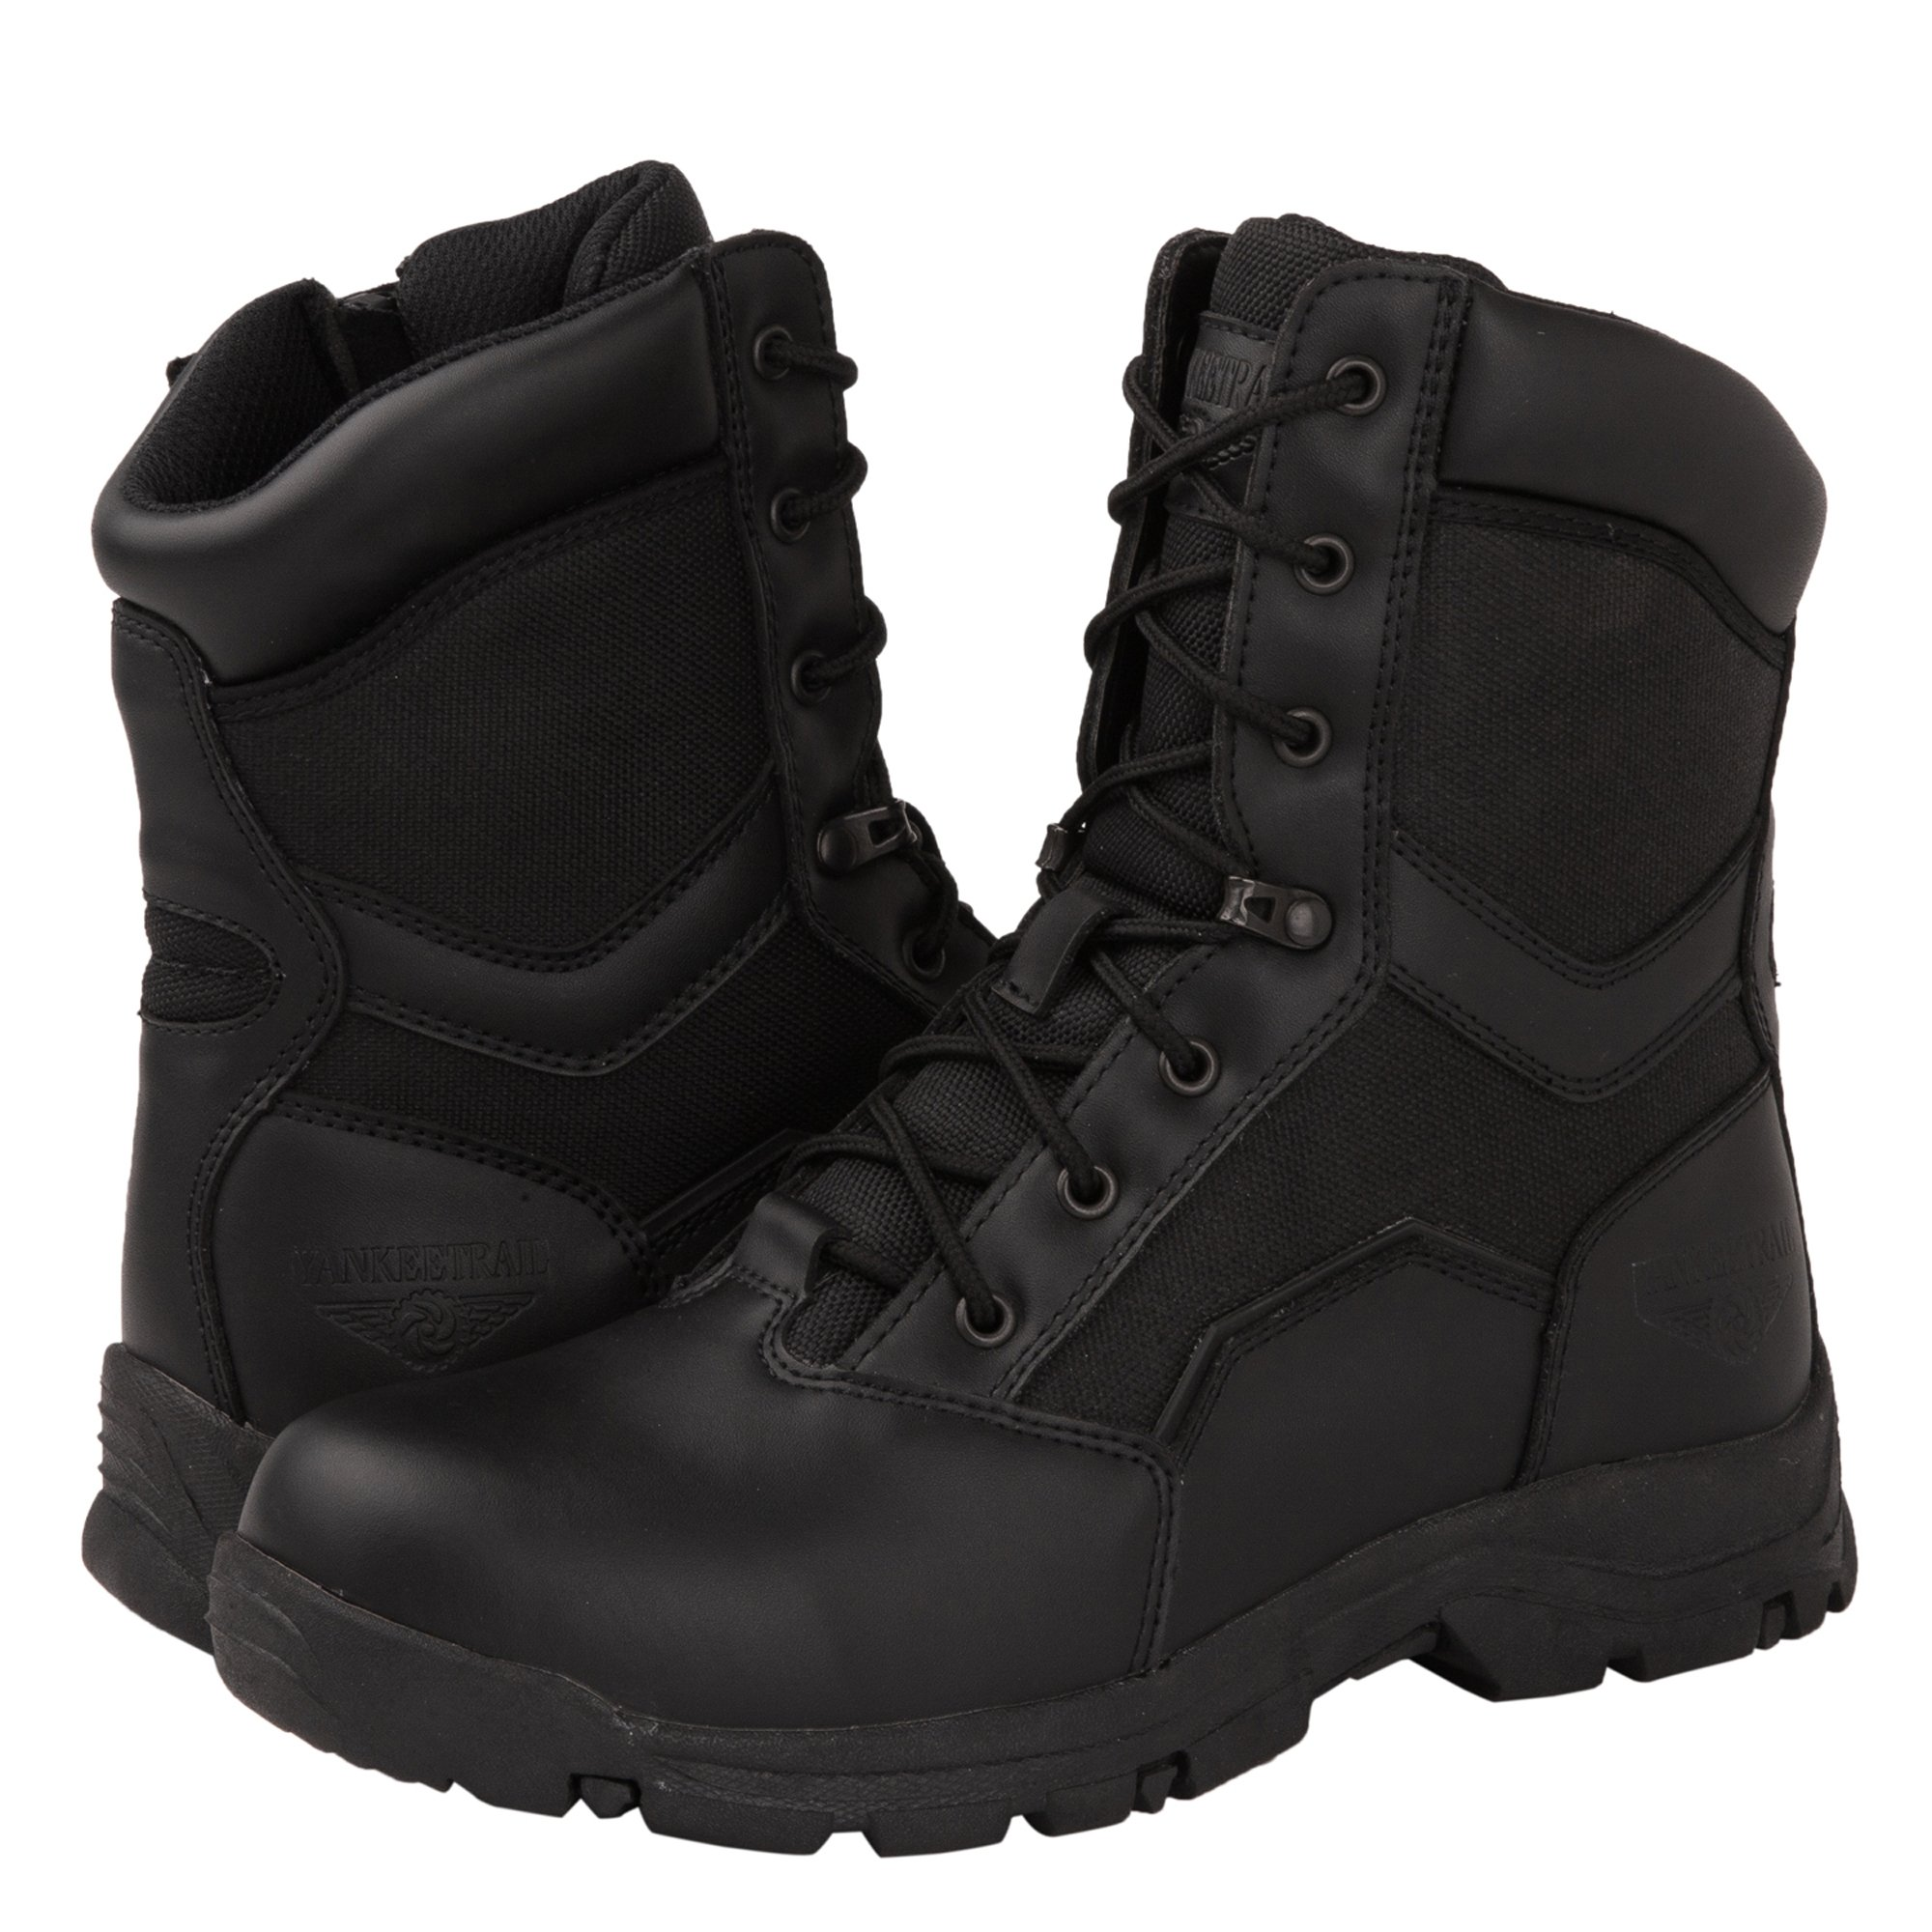 kingshow KS Men's Side Zip Work Boots 8.5 D(M) US, 1587BLK by KINGSHOW